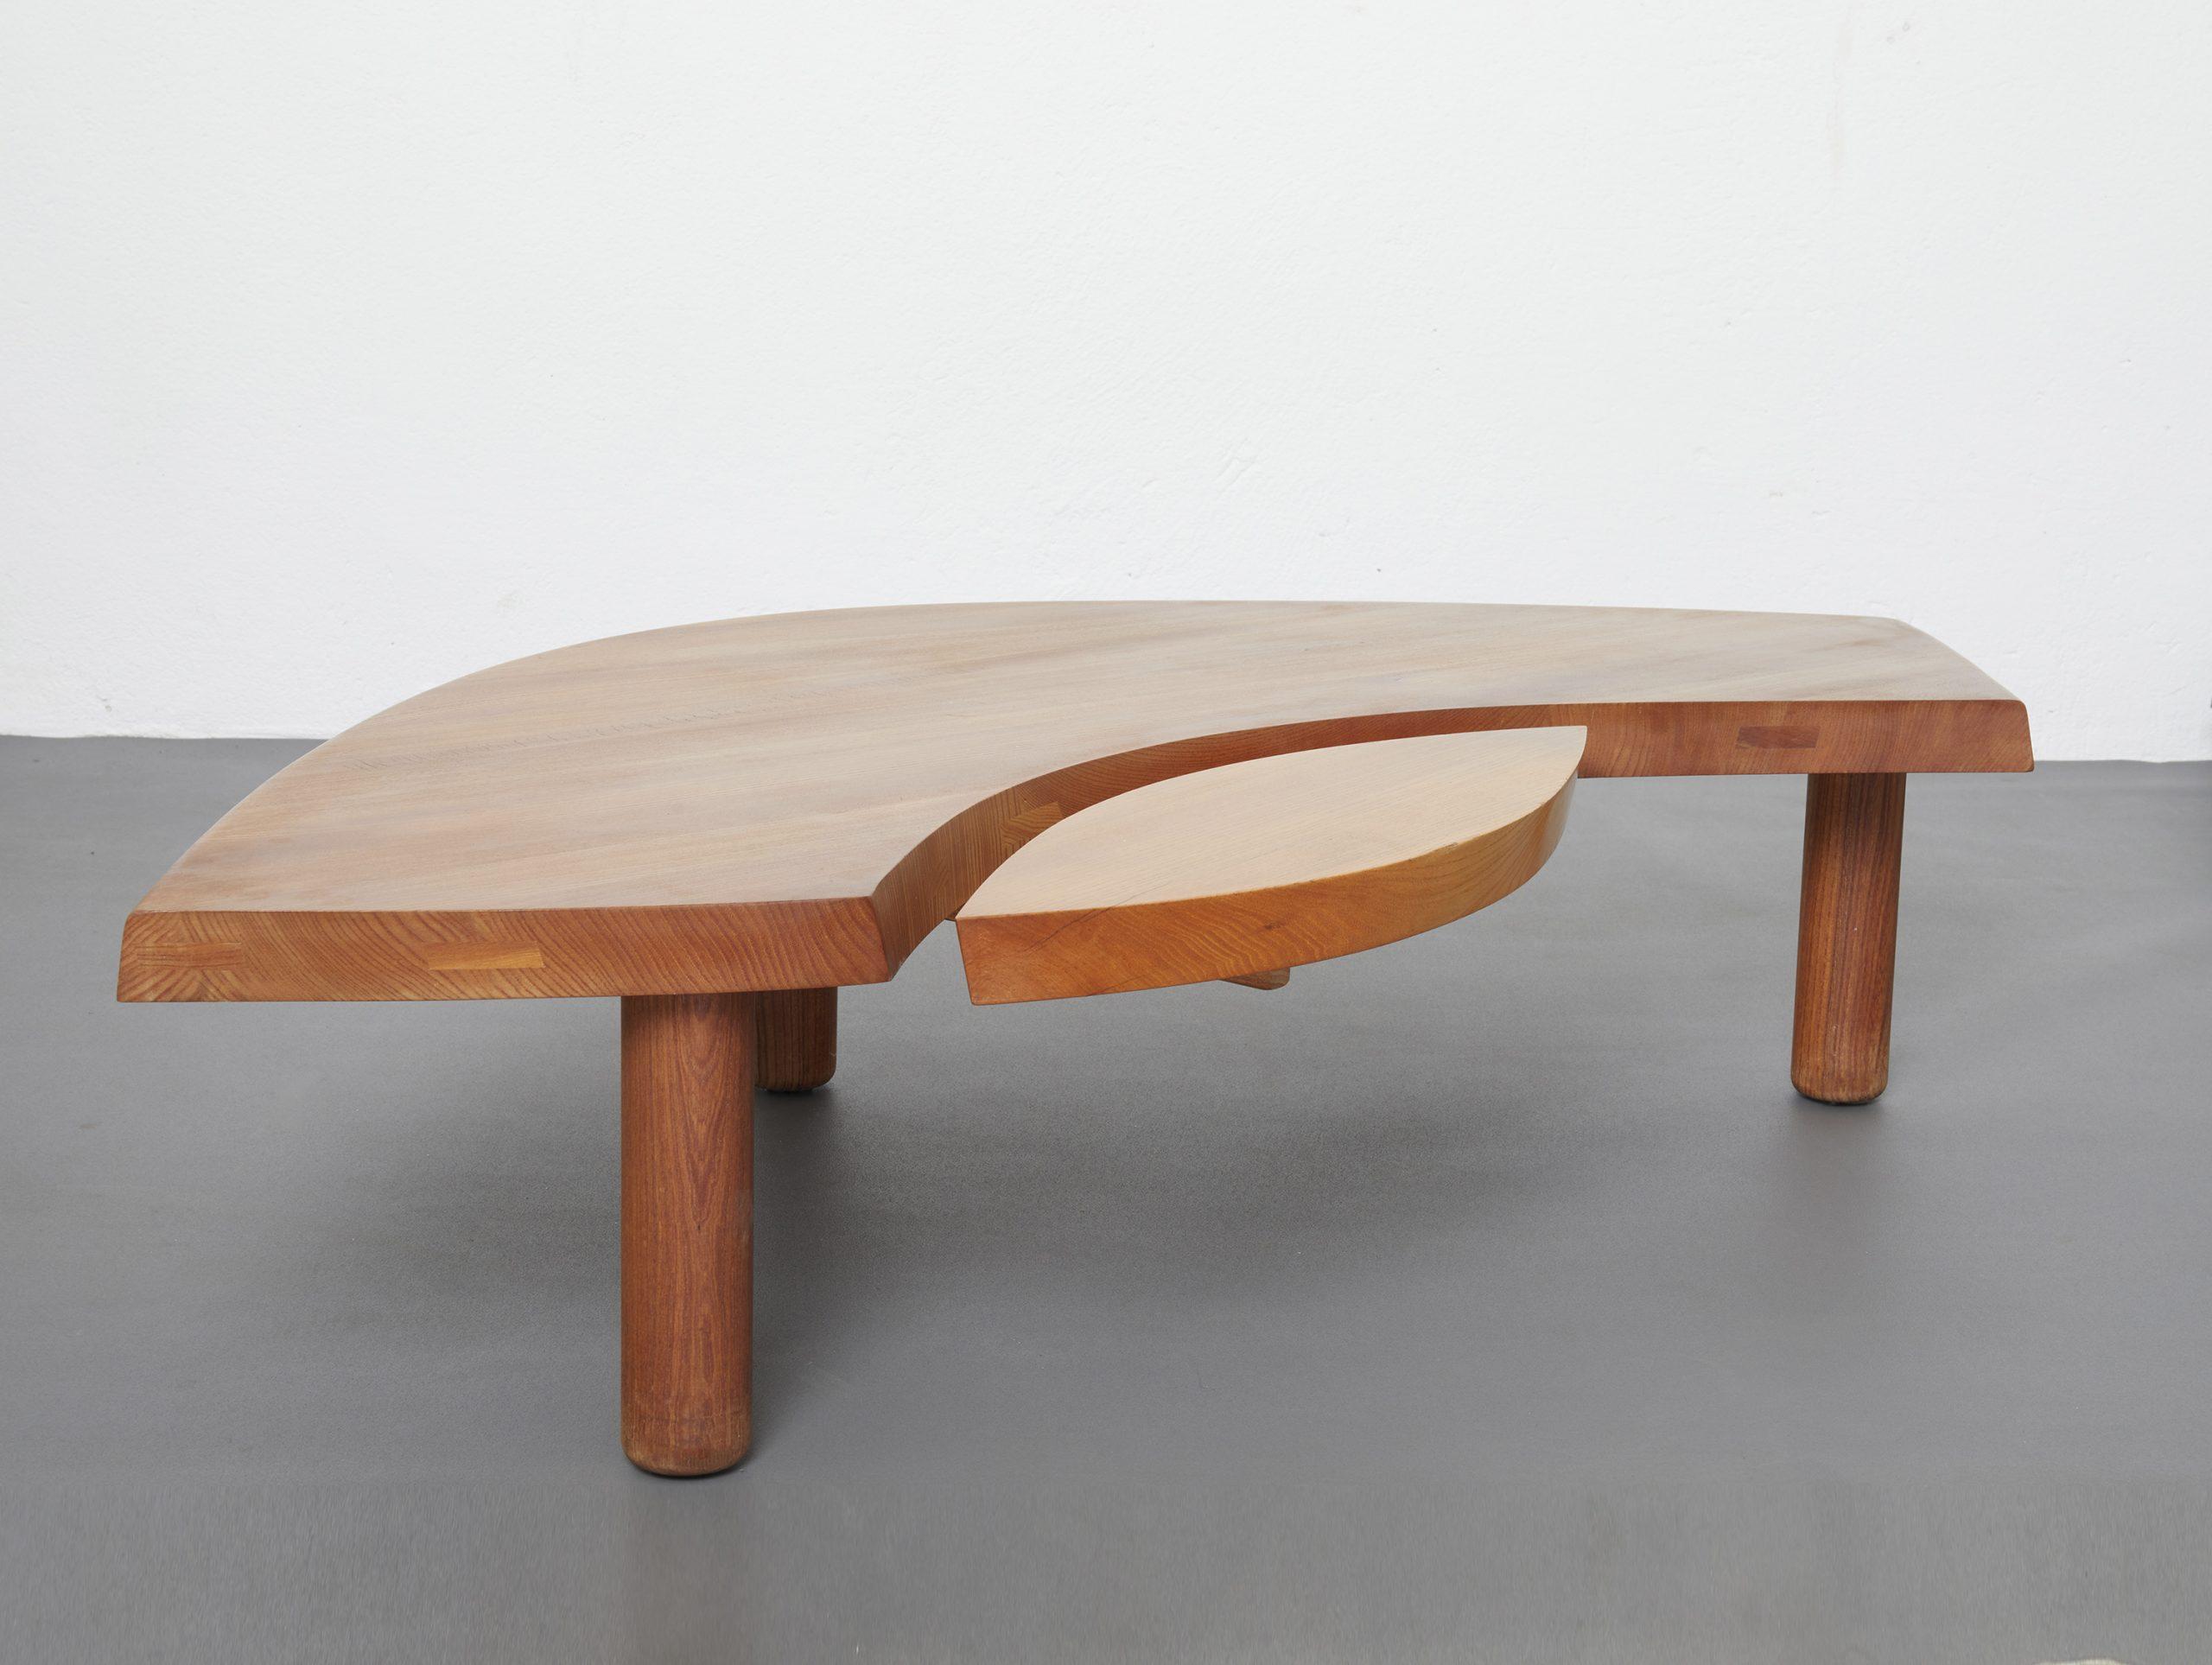 single-elmwood-low-table-t22-by-pierre-chapo-image-02